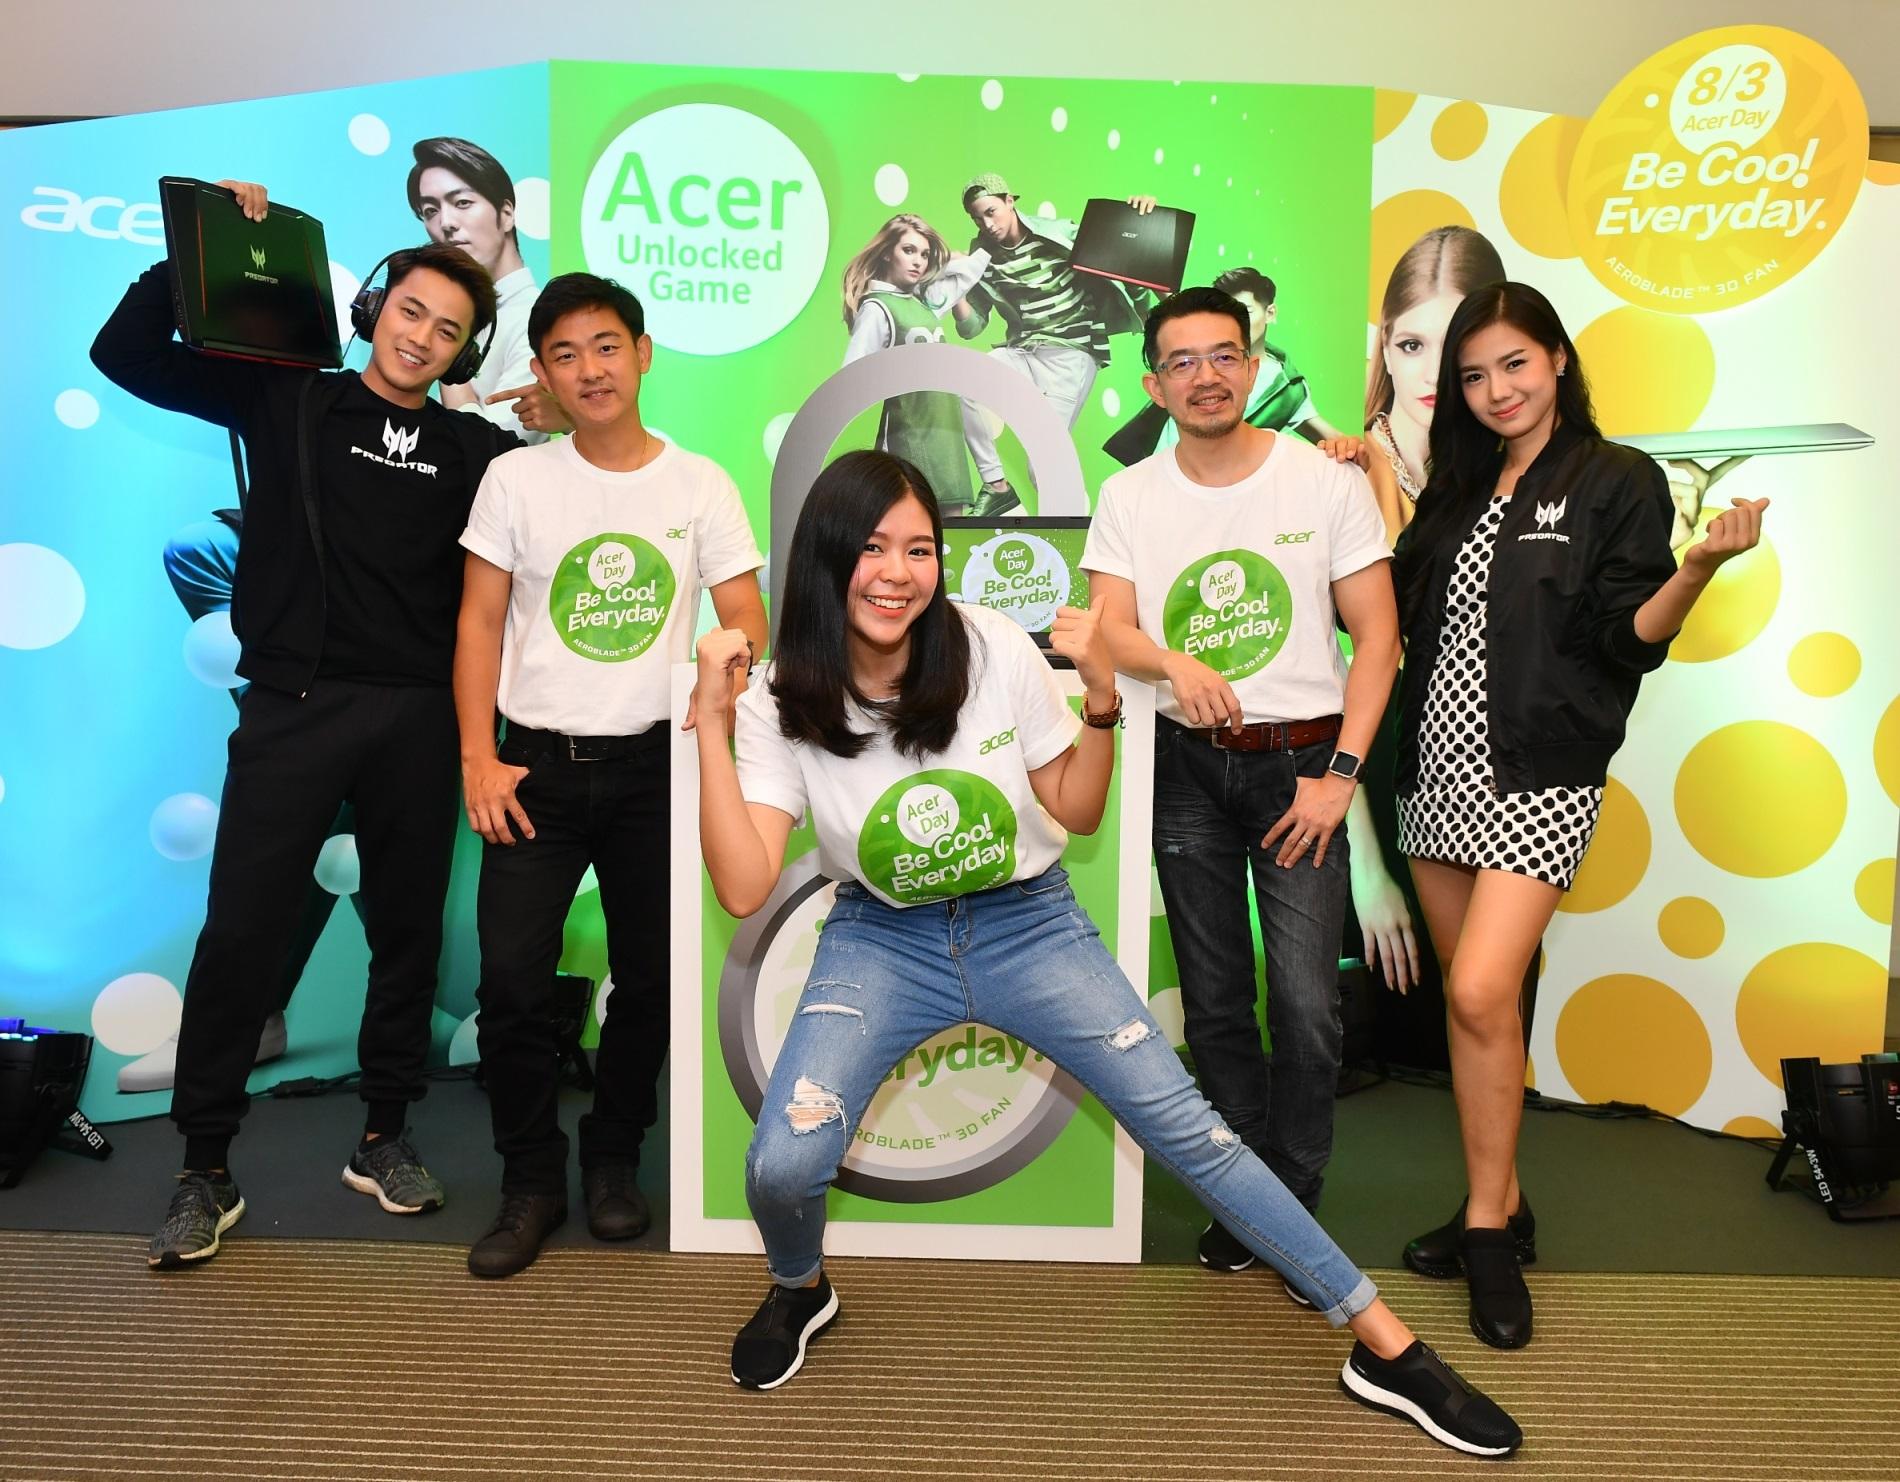 arr 2560 re เอเซอร์ซุ่มทุ่มไม่อั้นจัด Acer Day เพื่อคอเกม พร้อมกัน 12 ประเทศ พร้อมร่วมเชียร์การแข่งขันอีสปอร์ตสุดยิ่งใหญ่ เพื่อค้นหาตัวแทนสู่การแข่งขัน BUSAN 9th Esport 2017 World Championship ณ ประเทศเกาหลีใต้